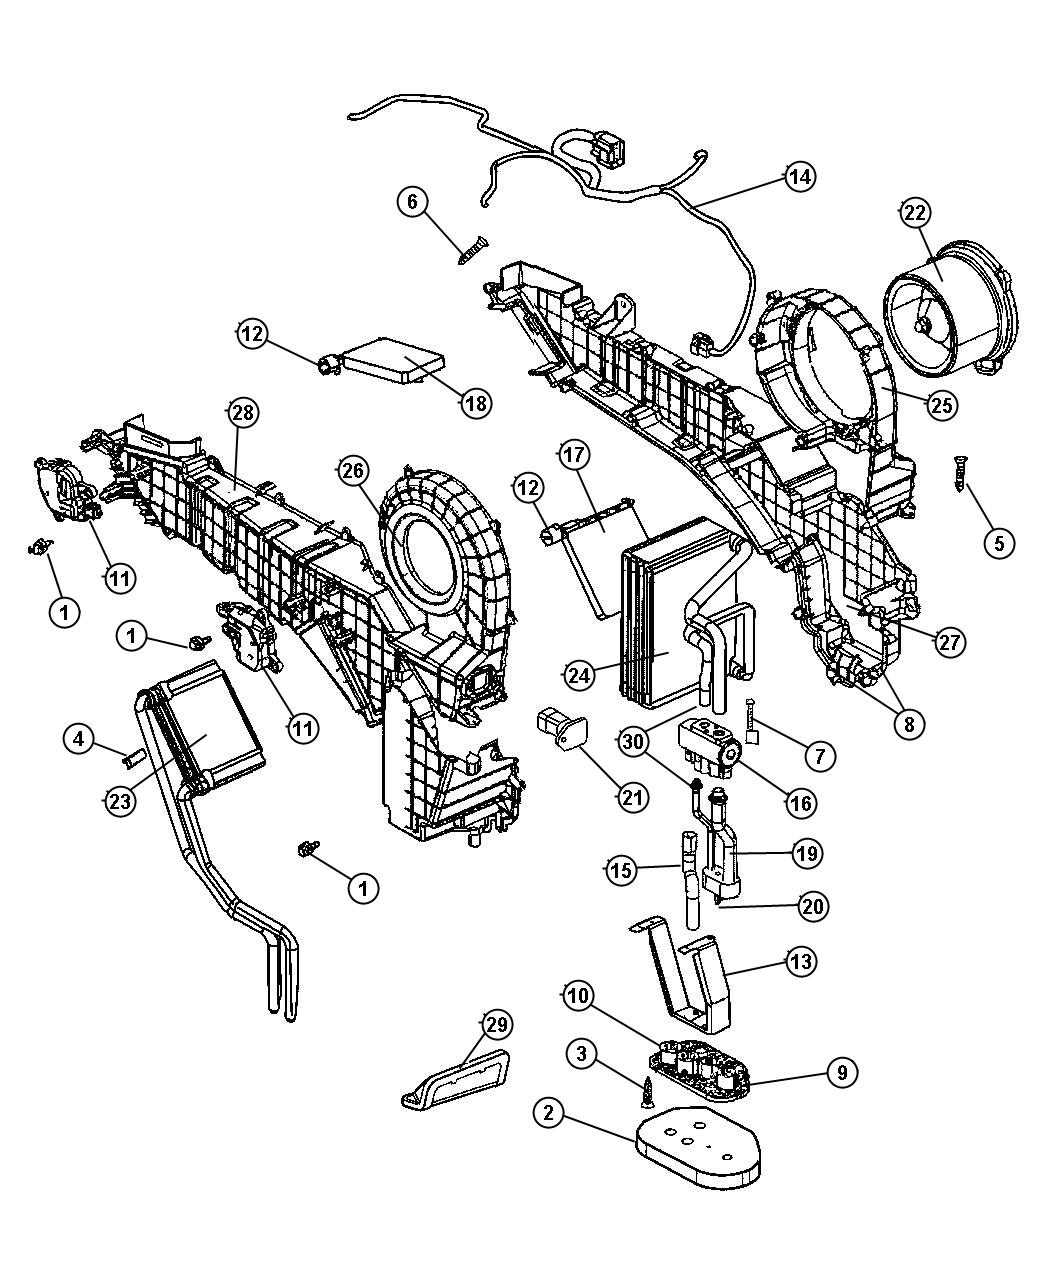 Dodge Durango Valve Expansion Air Heater